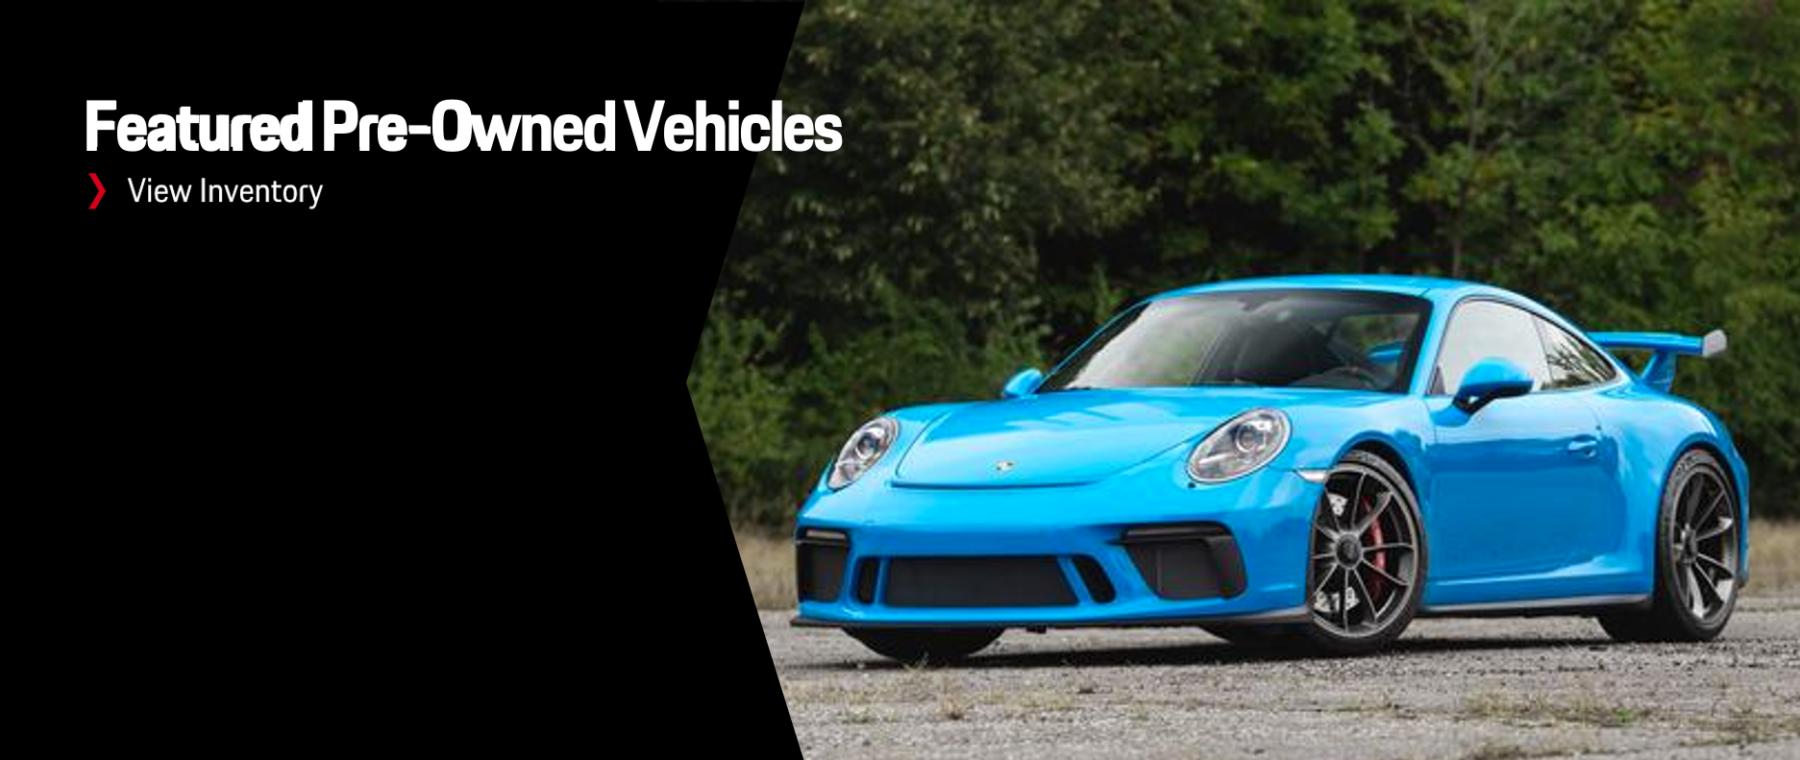 Porsche Featured Vehicles